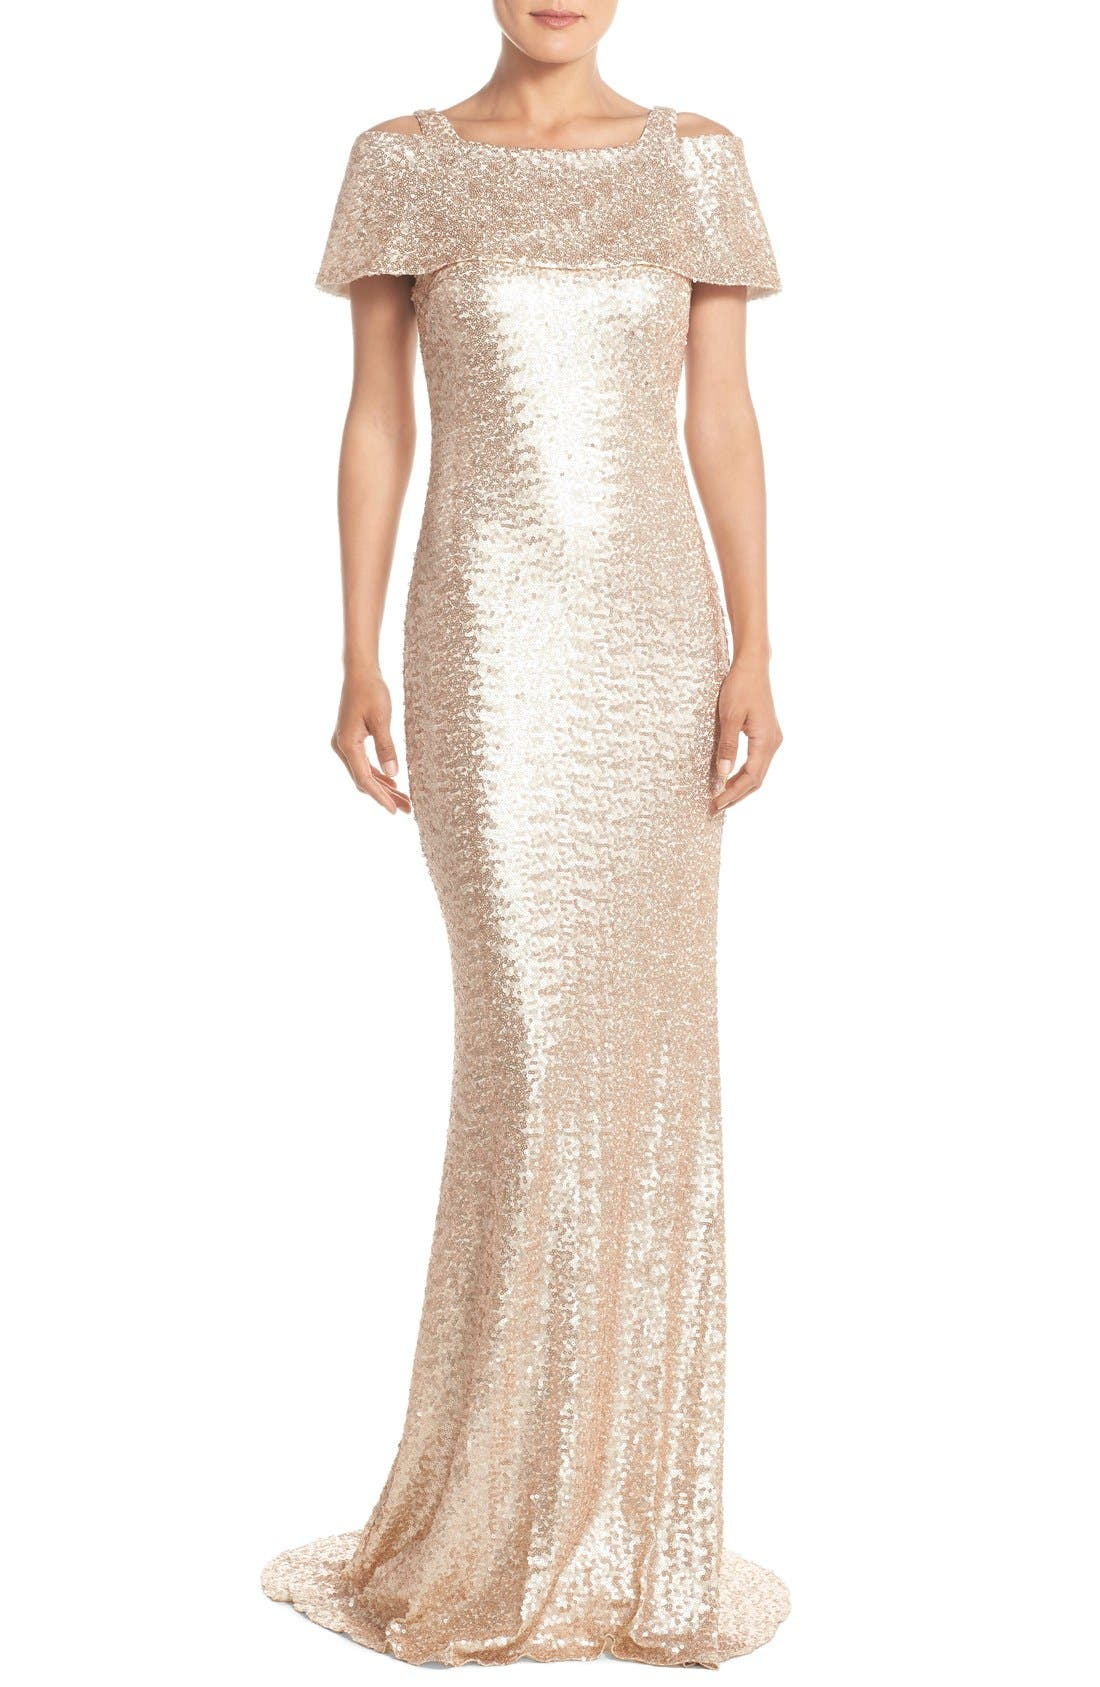 Main Image - Badgley Mischka Cold Shoulder Sequin Body-Con Gown